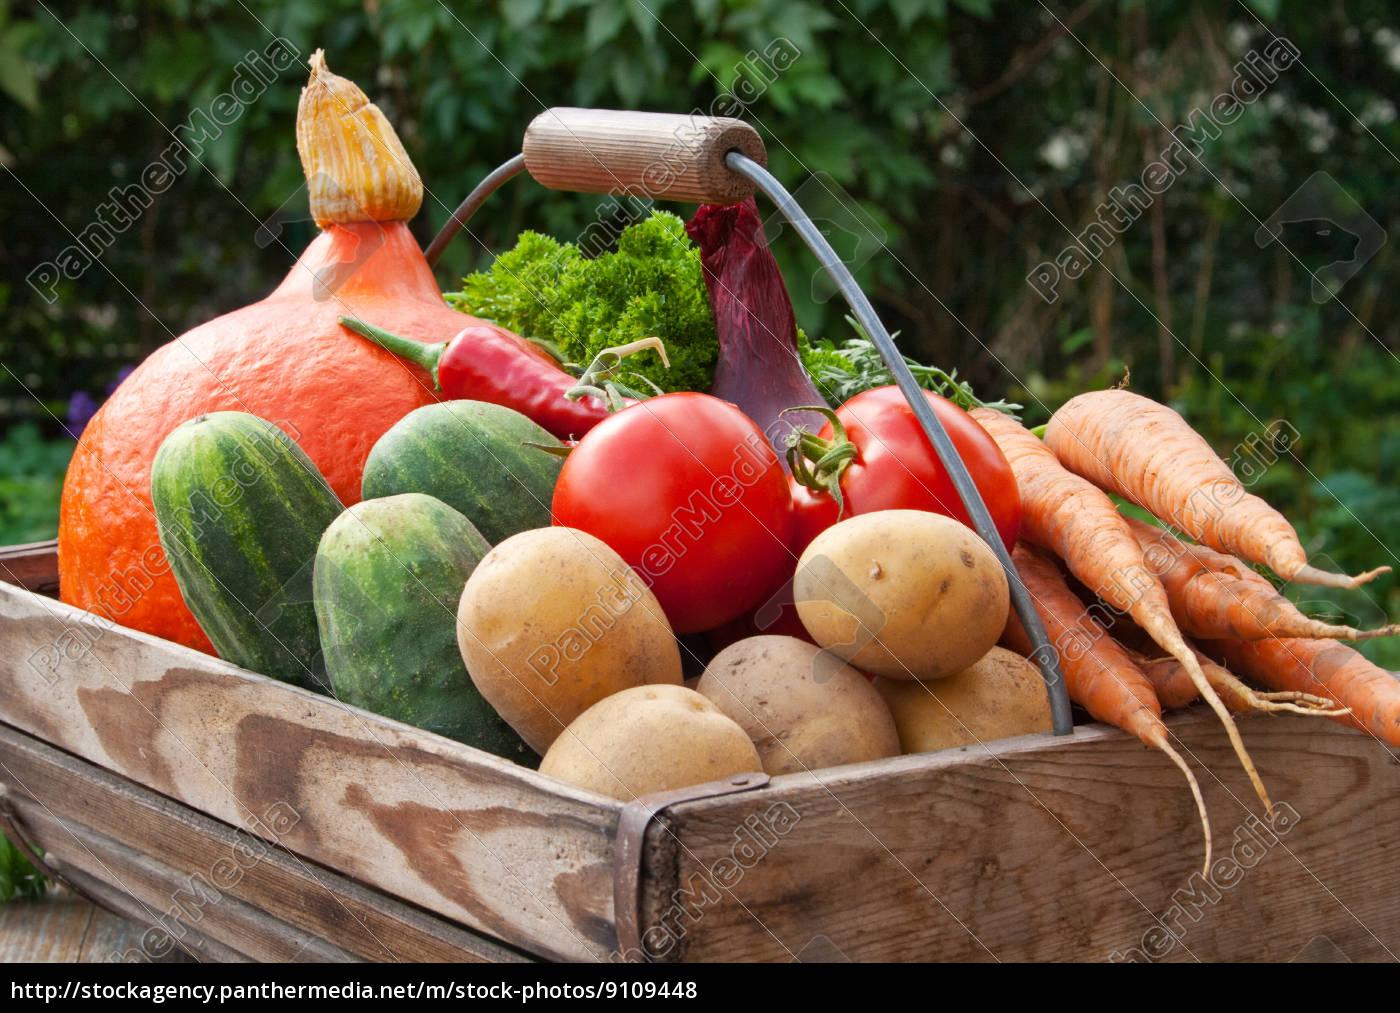 orange, apfelsine, pomeranze, essen, nahrungsmittel, lebensmittel - 9109448